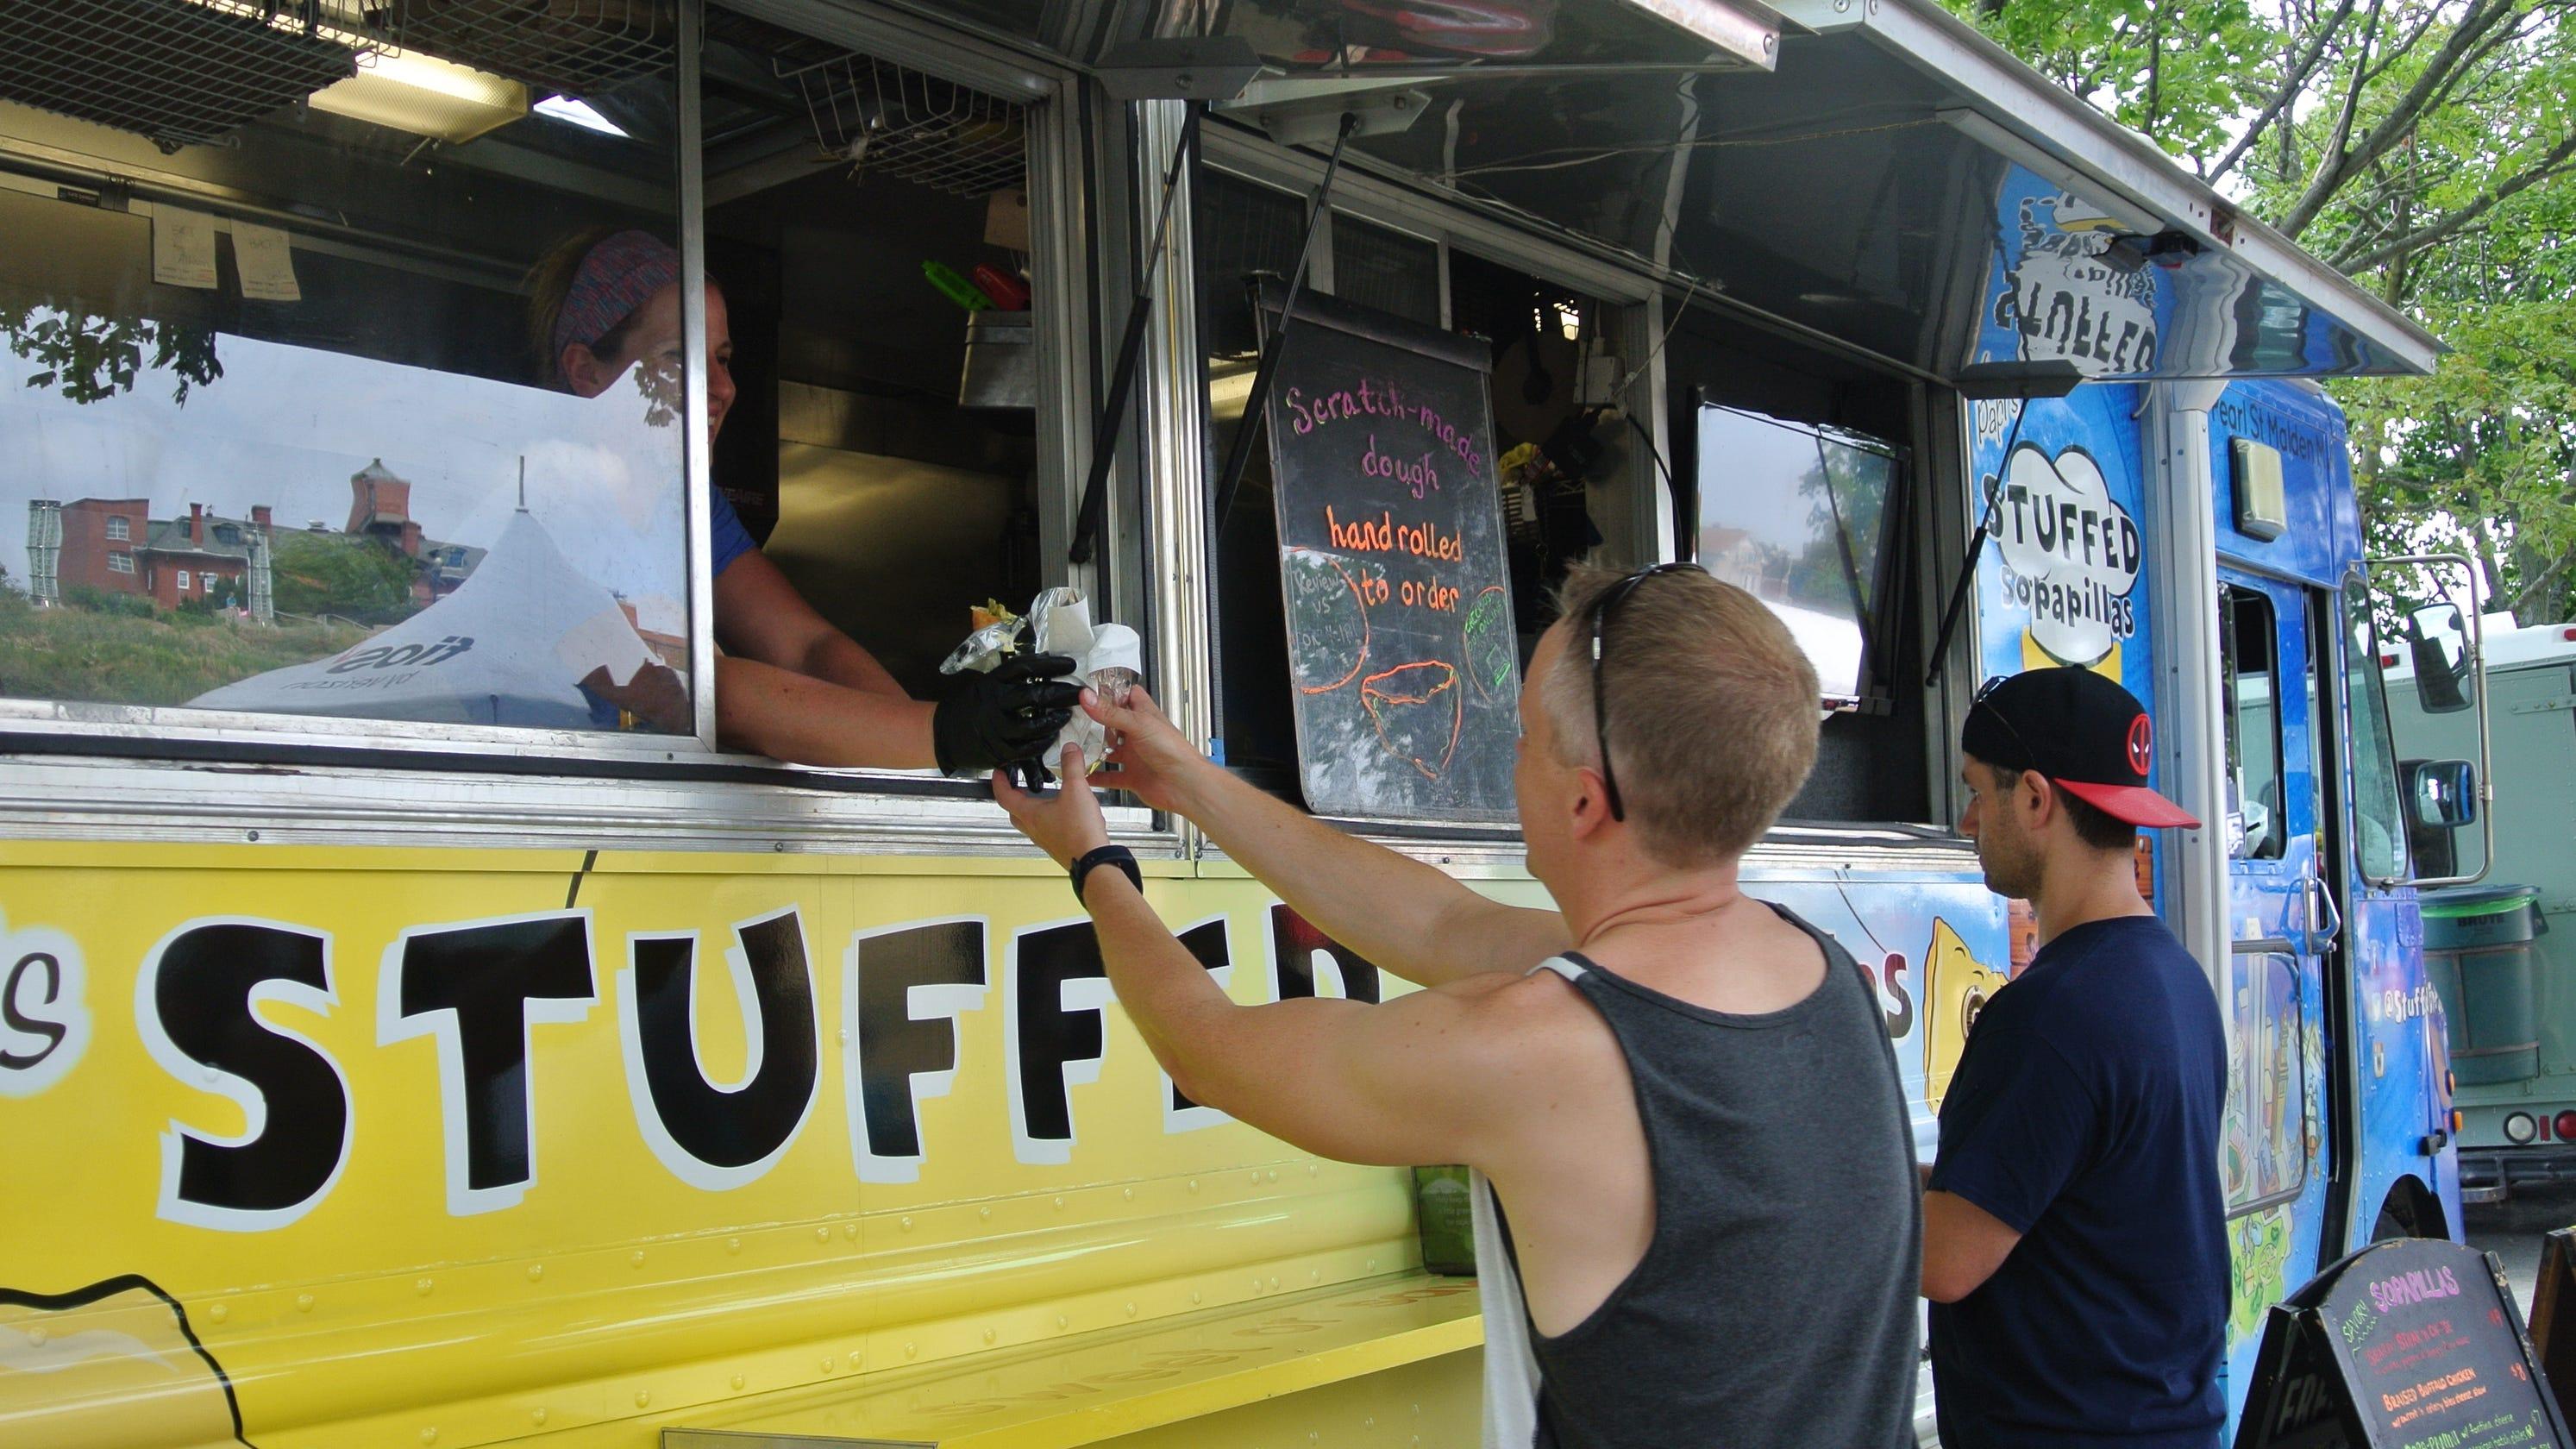 The memphis food truck craft beer festival set in southaven for Food truck and craft beer festival